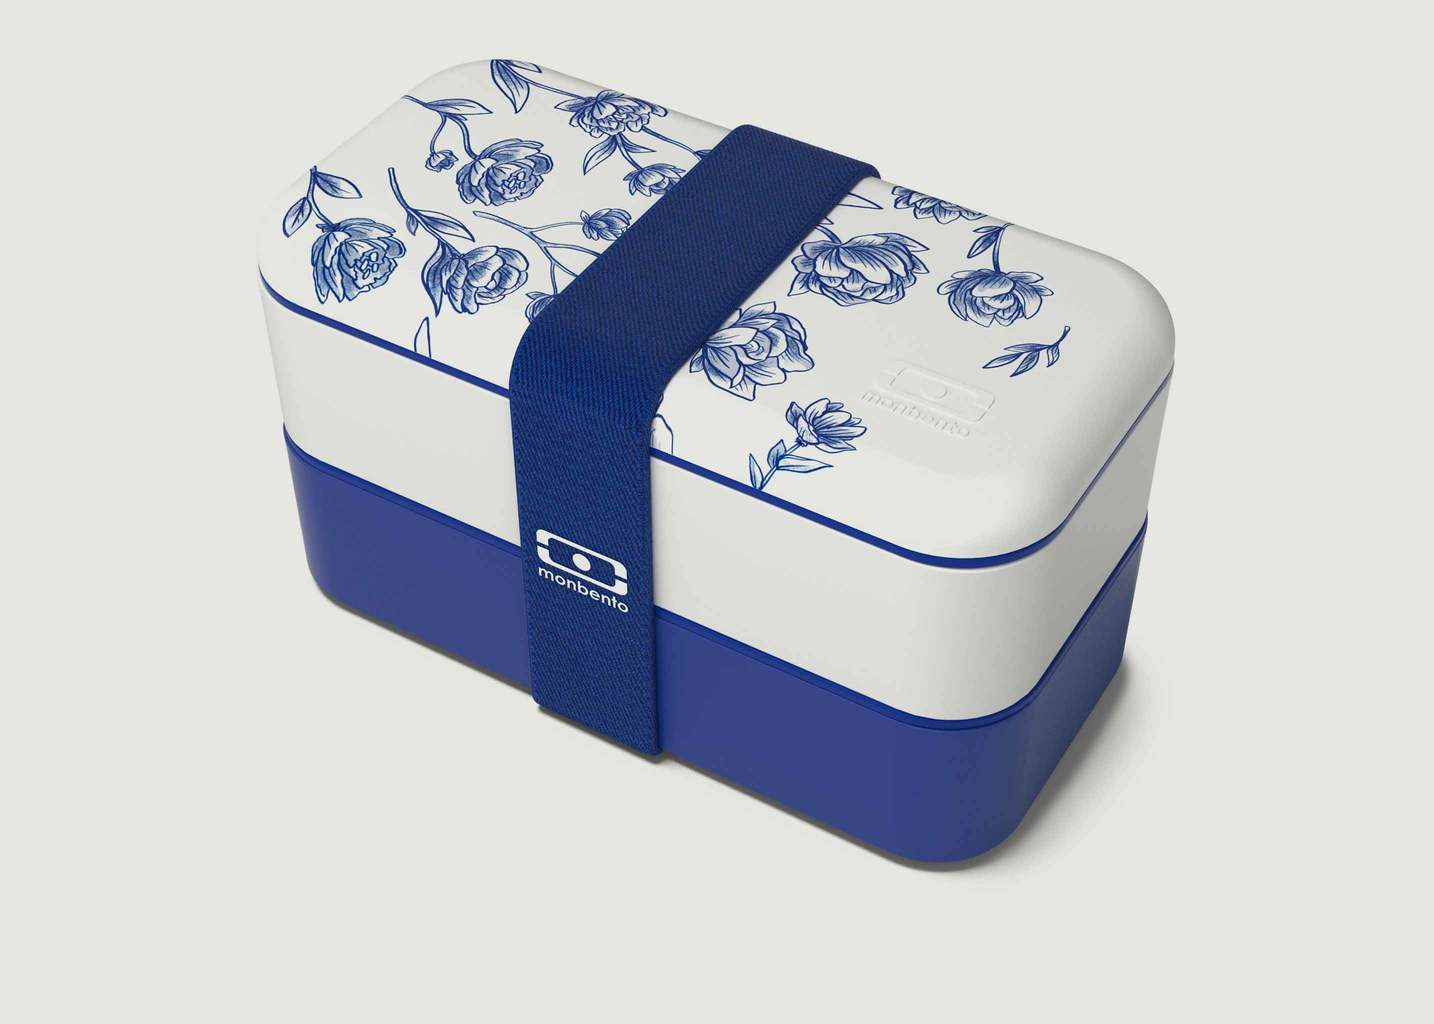 La Boîte Bento Porcelaine - monbento